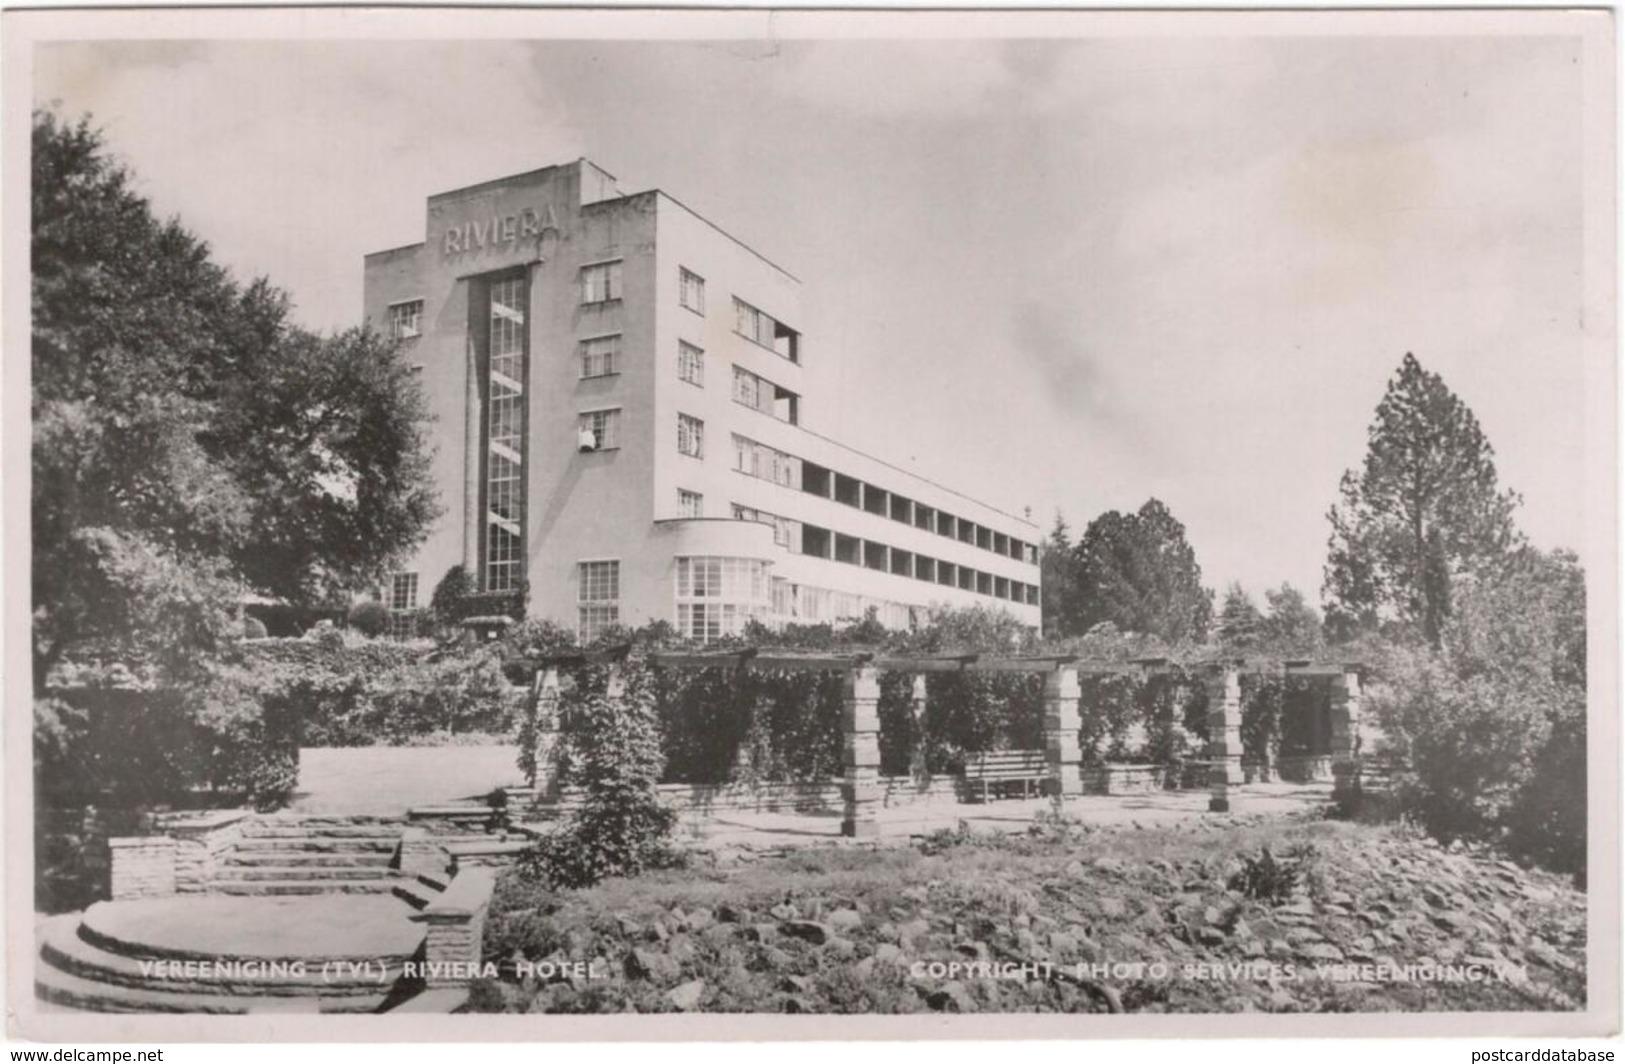 Vereeniging Tvl Riviera Hotel - & Hotel, Architecture - South Africa